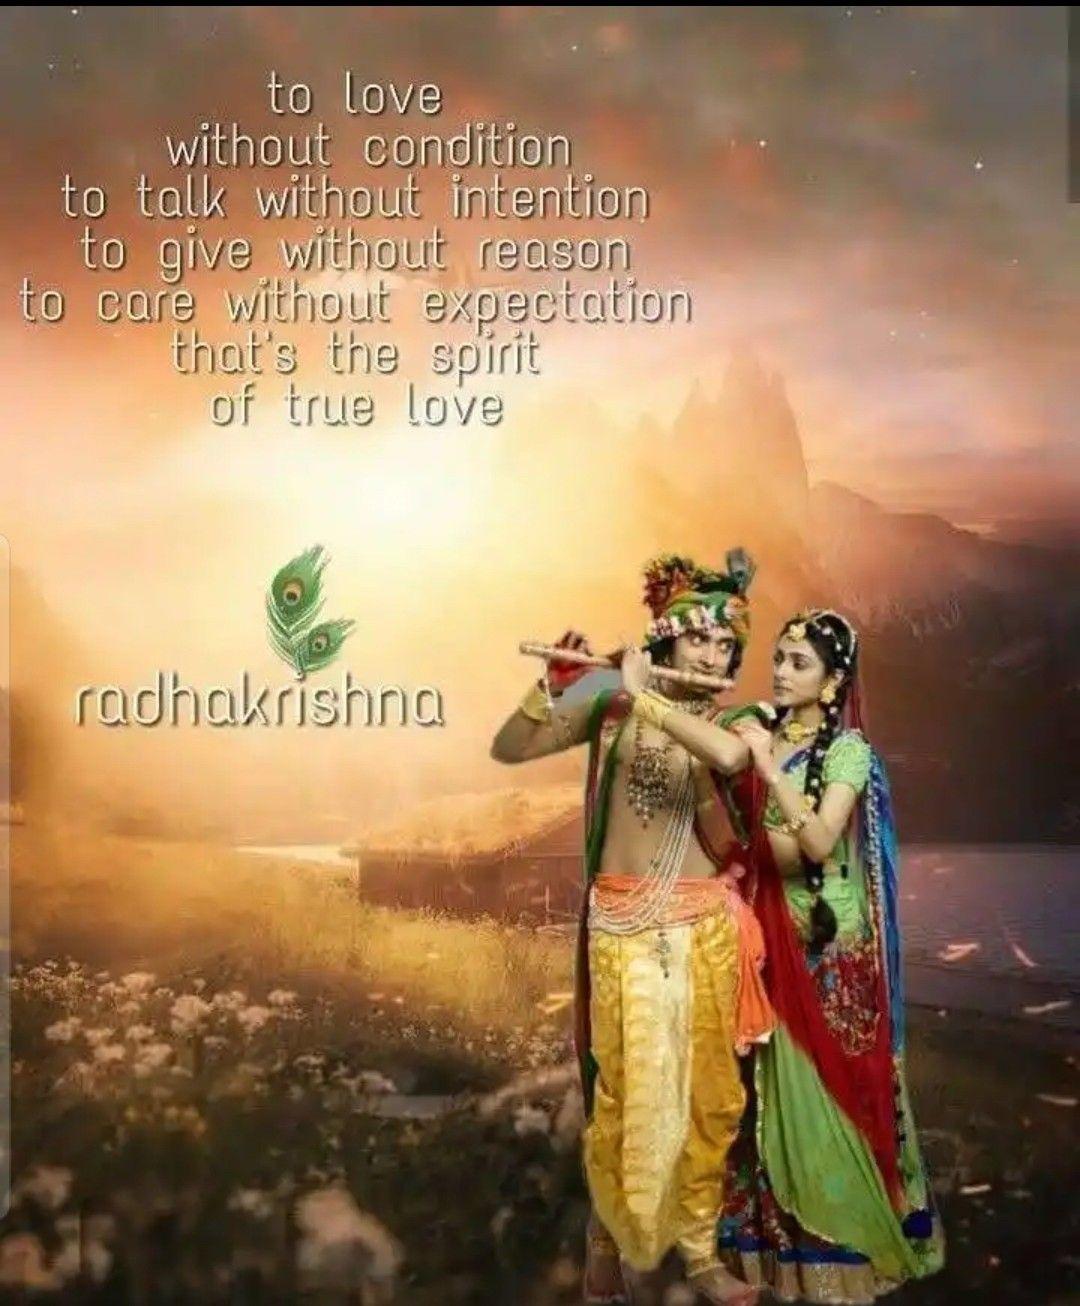 Pin By Sakshi On Sanya Radha Krishna Quotes Radha Krishna Love Quotes Krishna Quotes